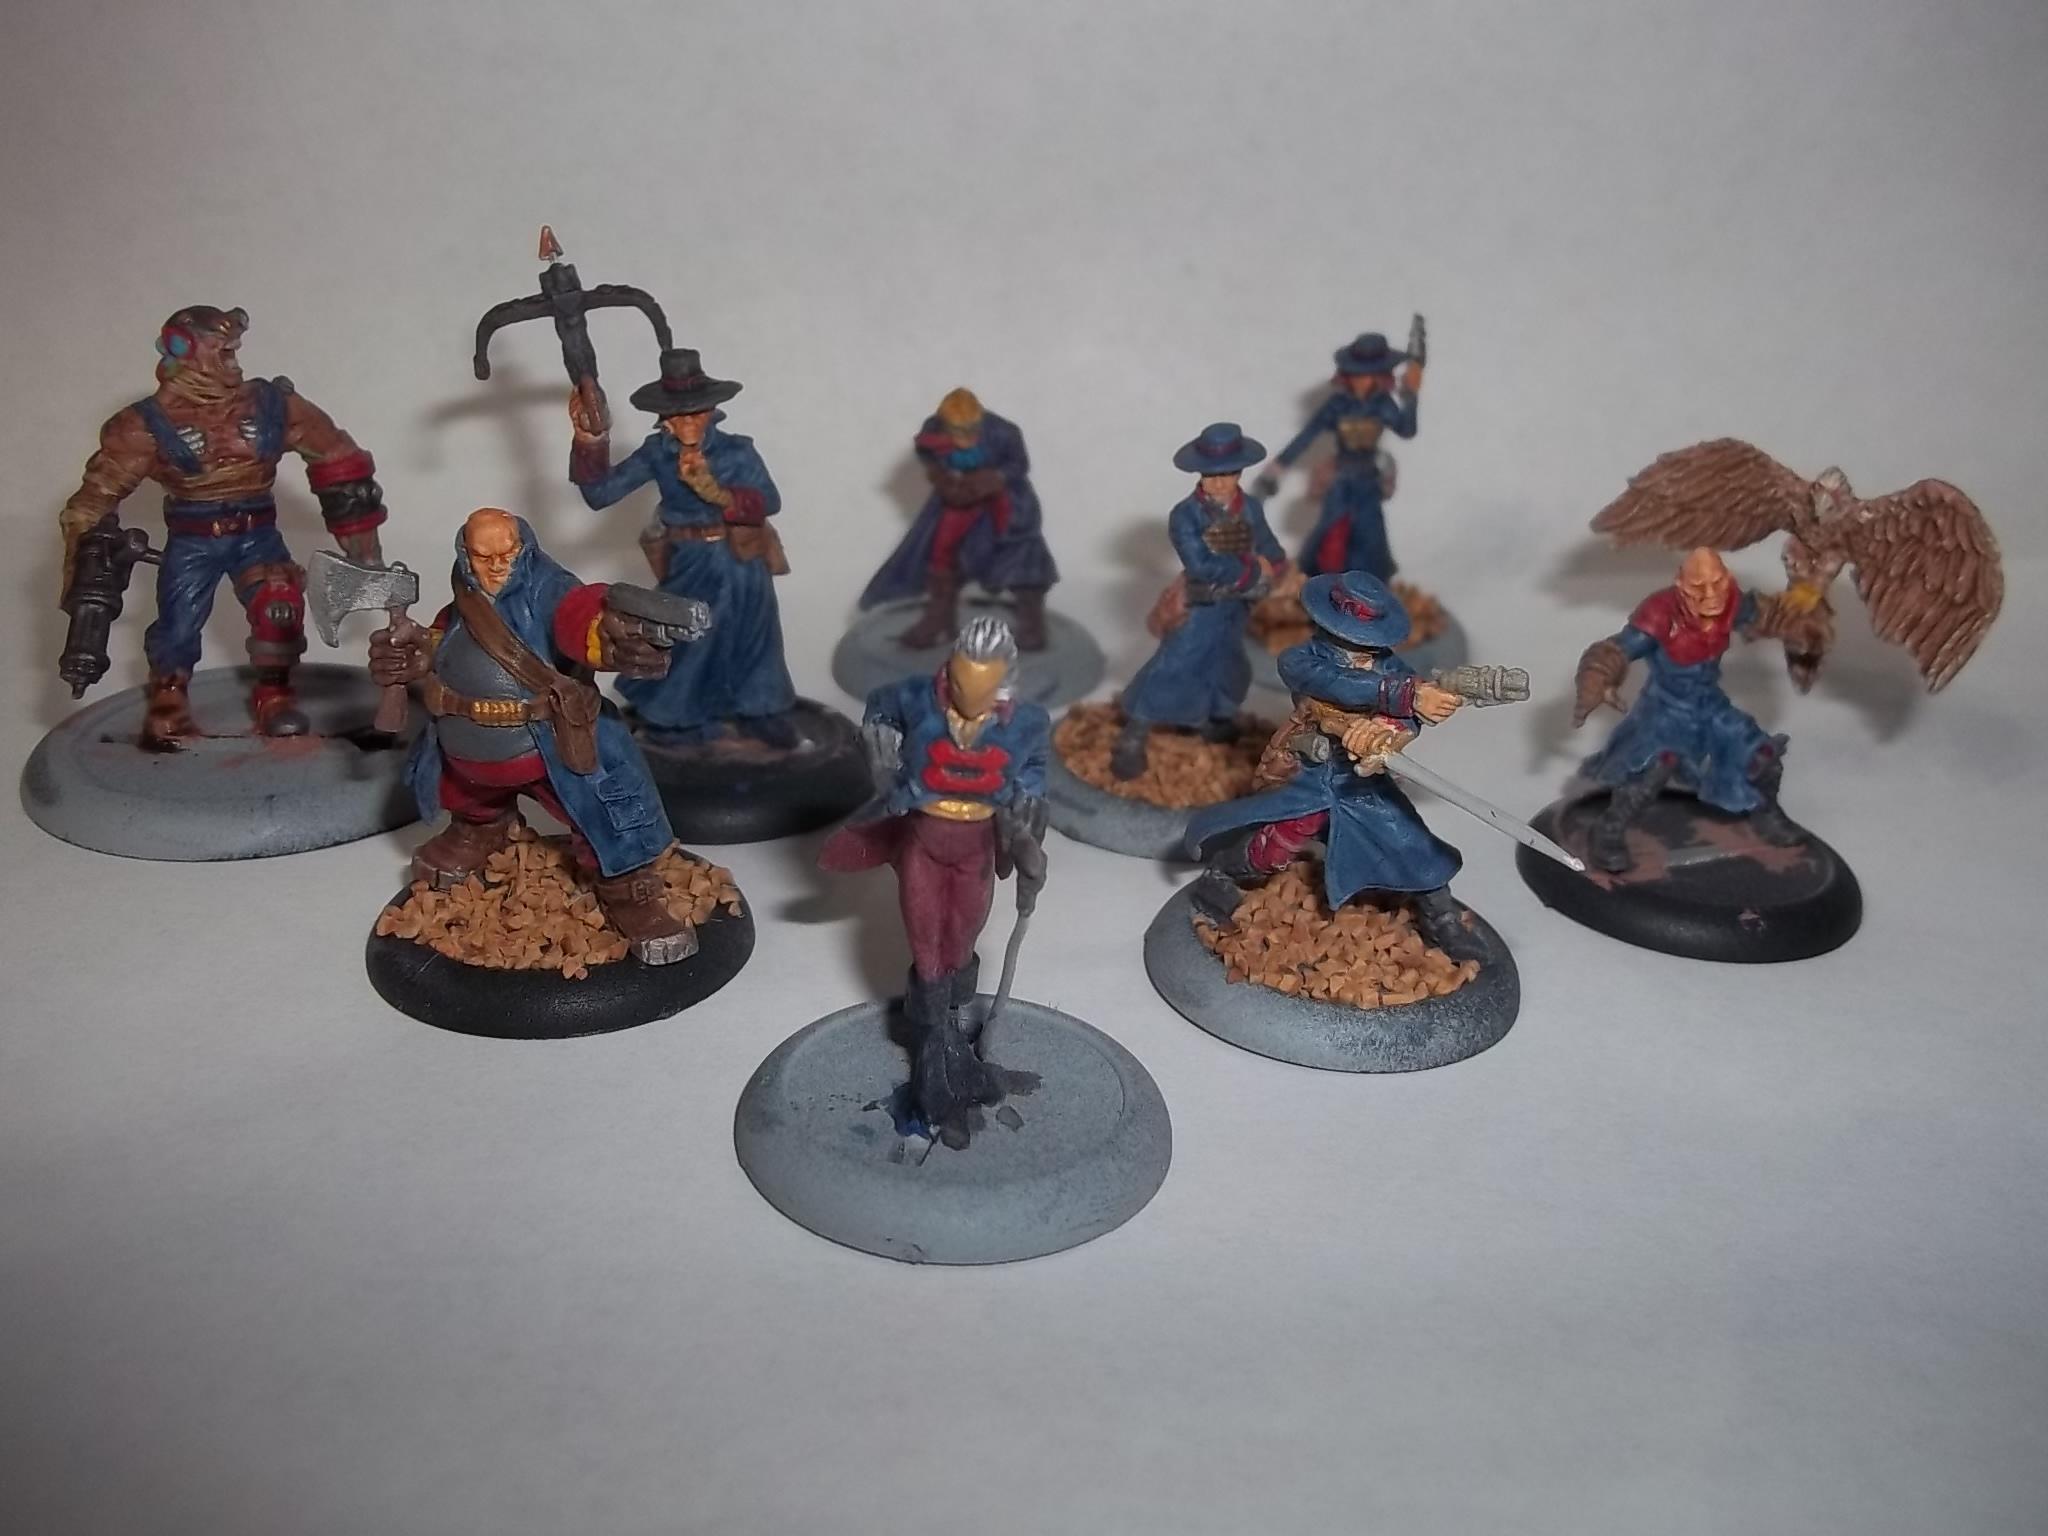 Malicaux, Guild members